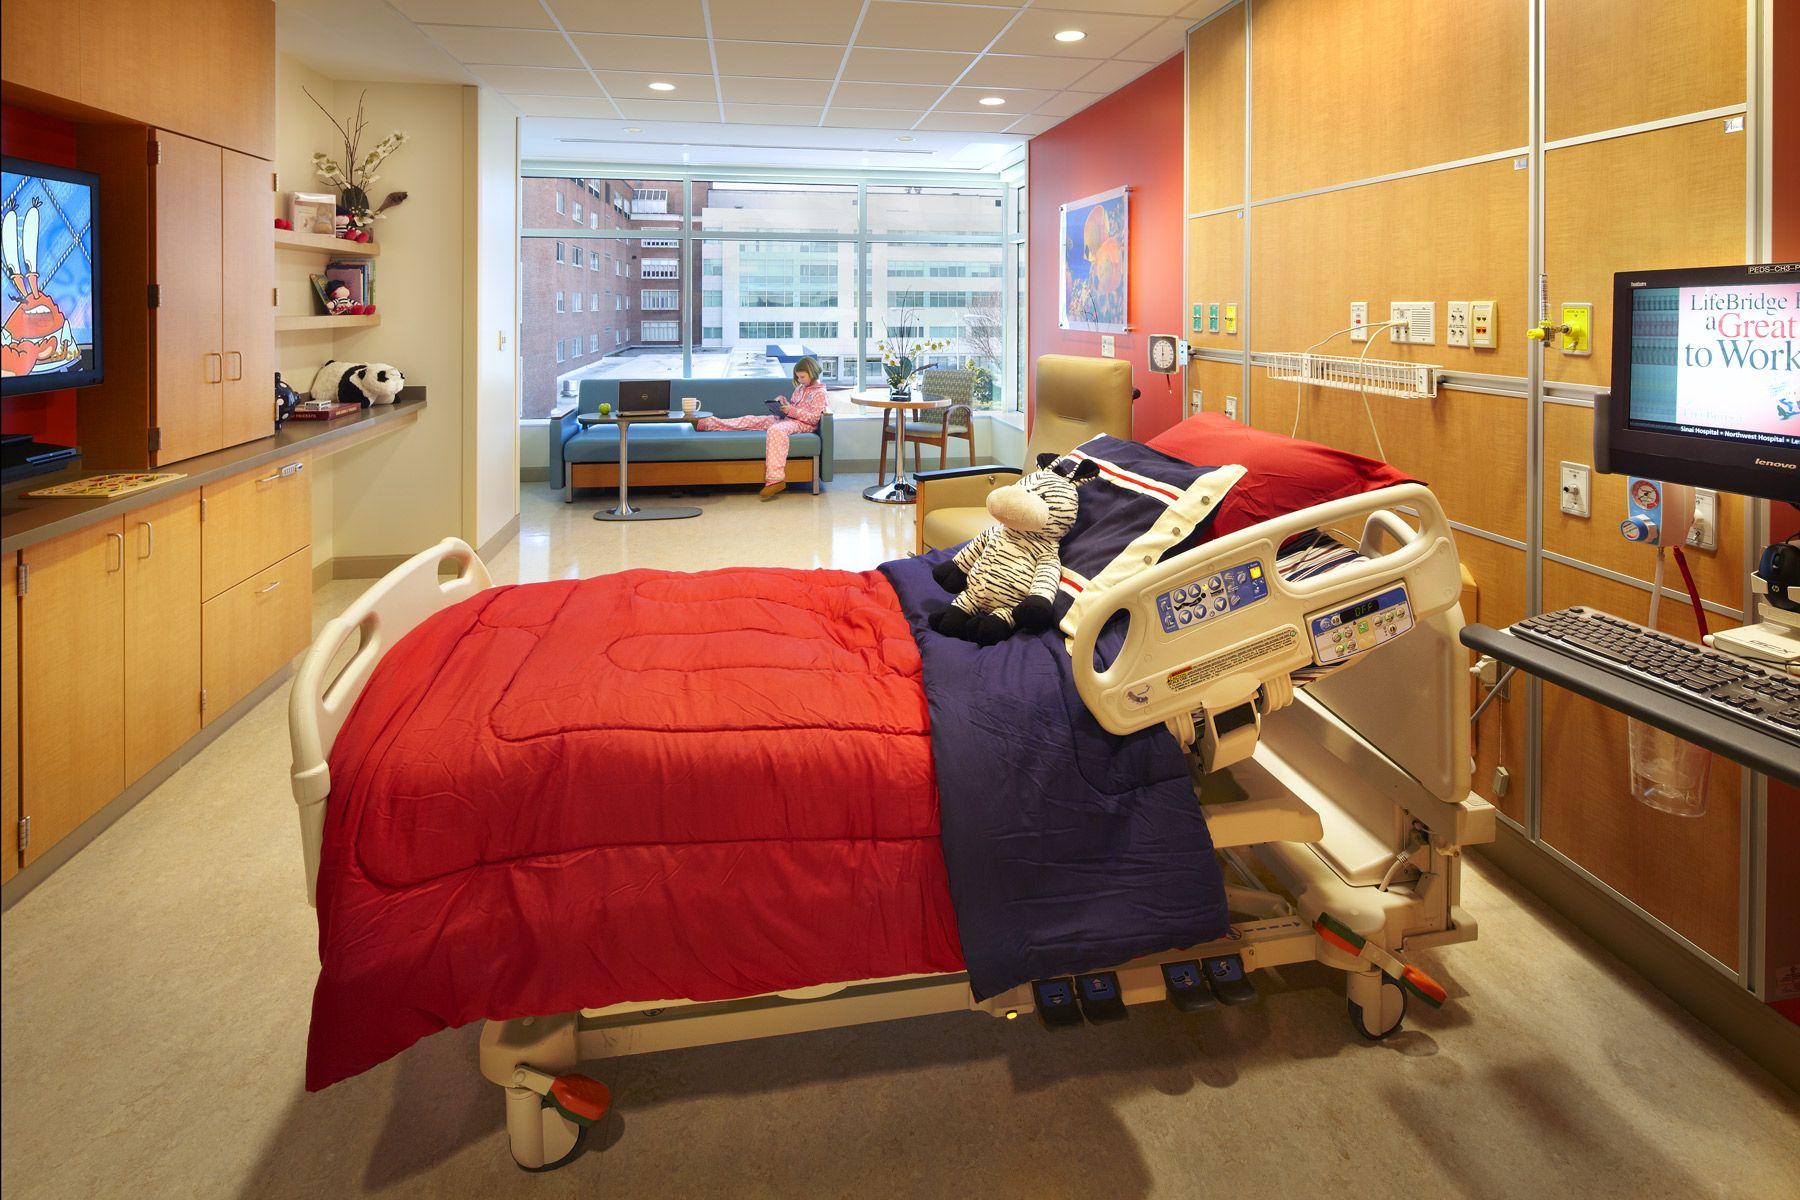 Children S Hospital Design Grows Up Hospital Design Children Hospital Design Childrens Hospital